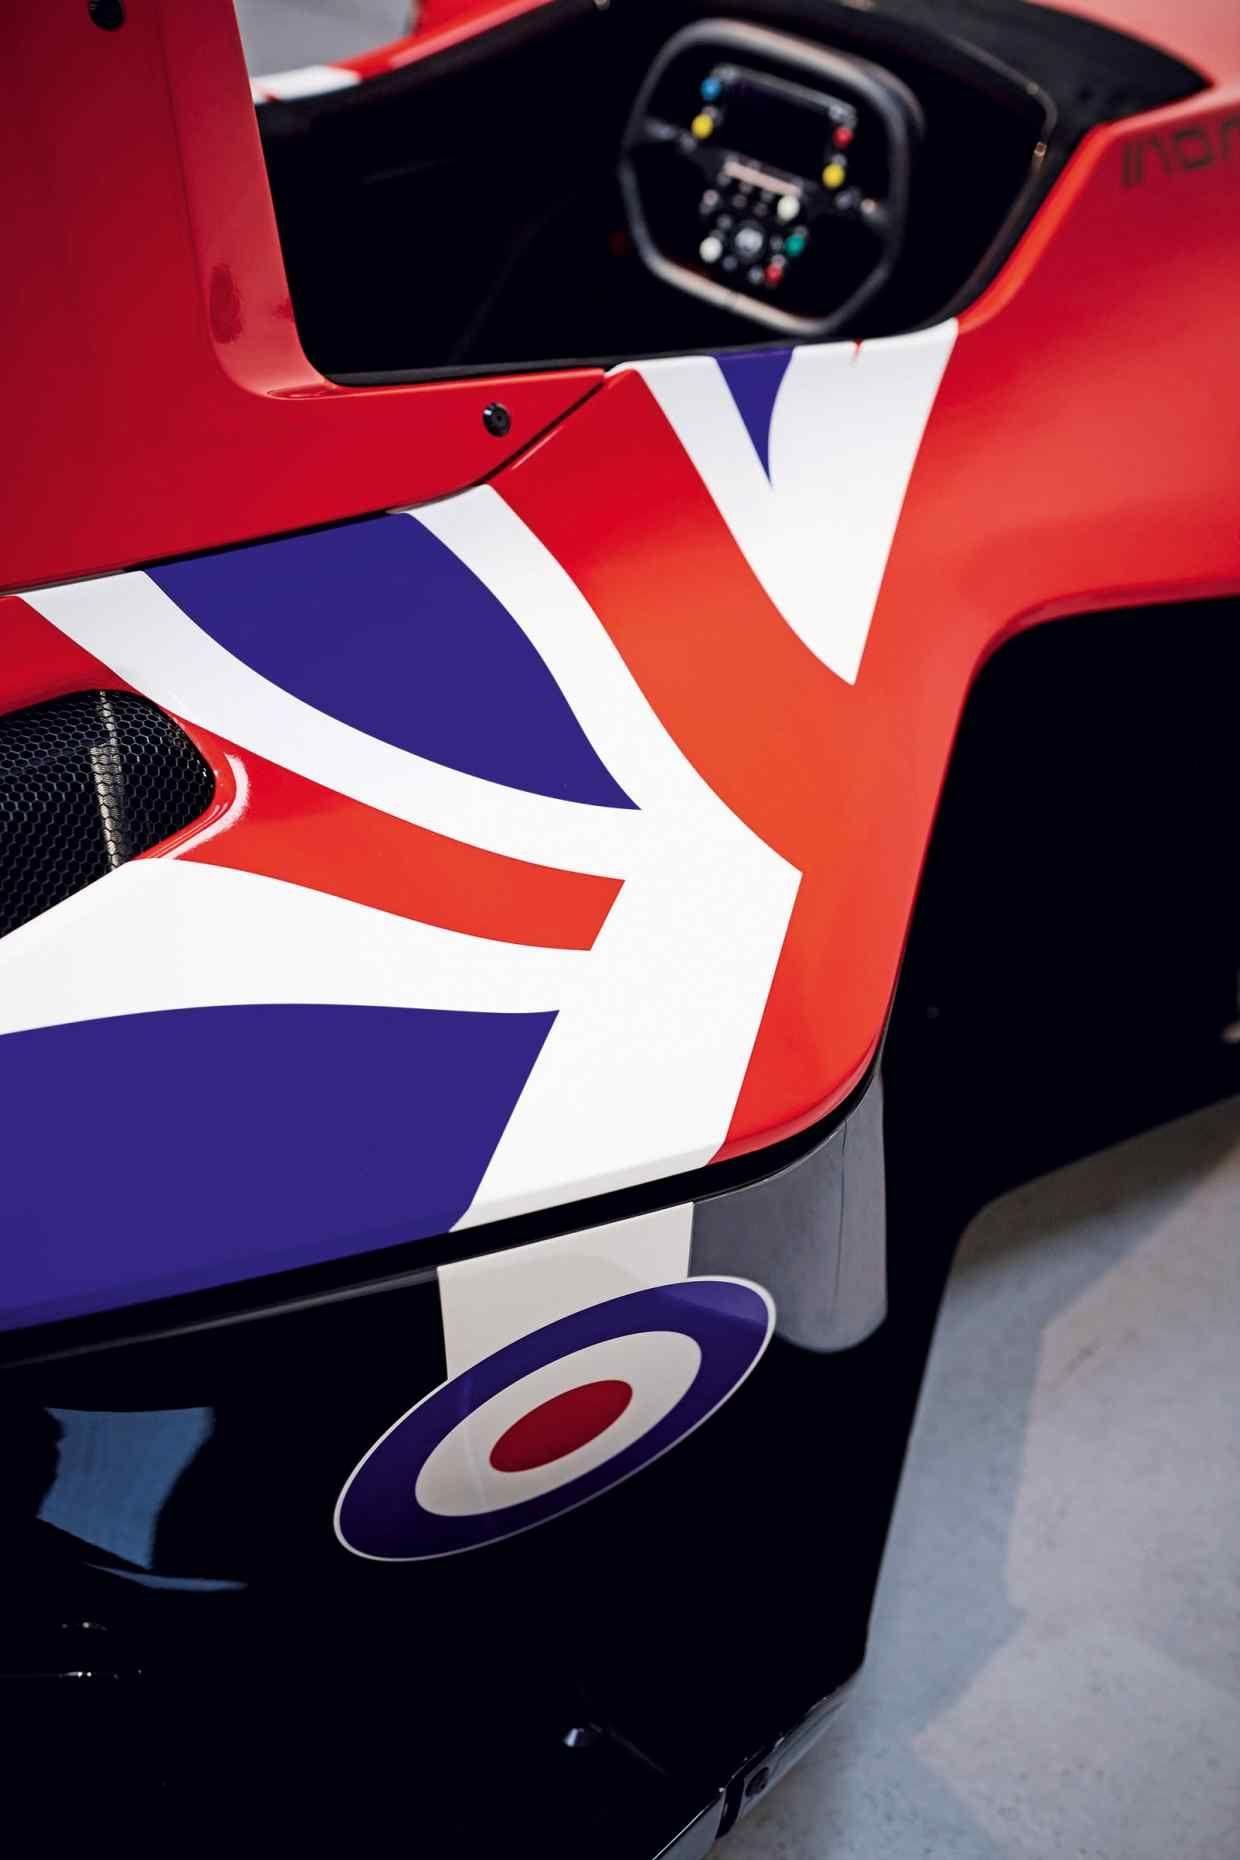 Roadlegal racing cars for speed junkies Race cars